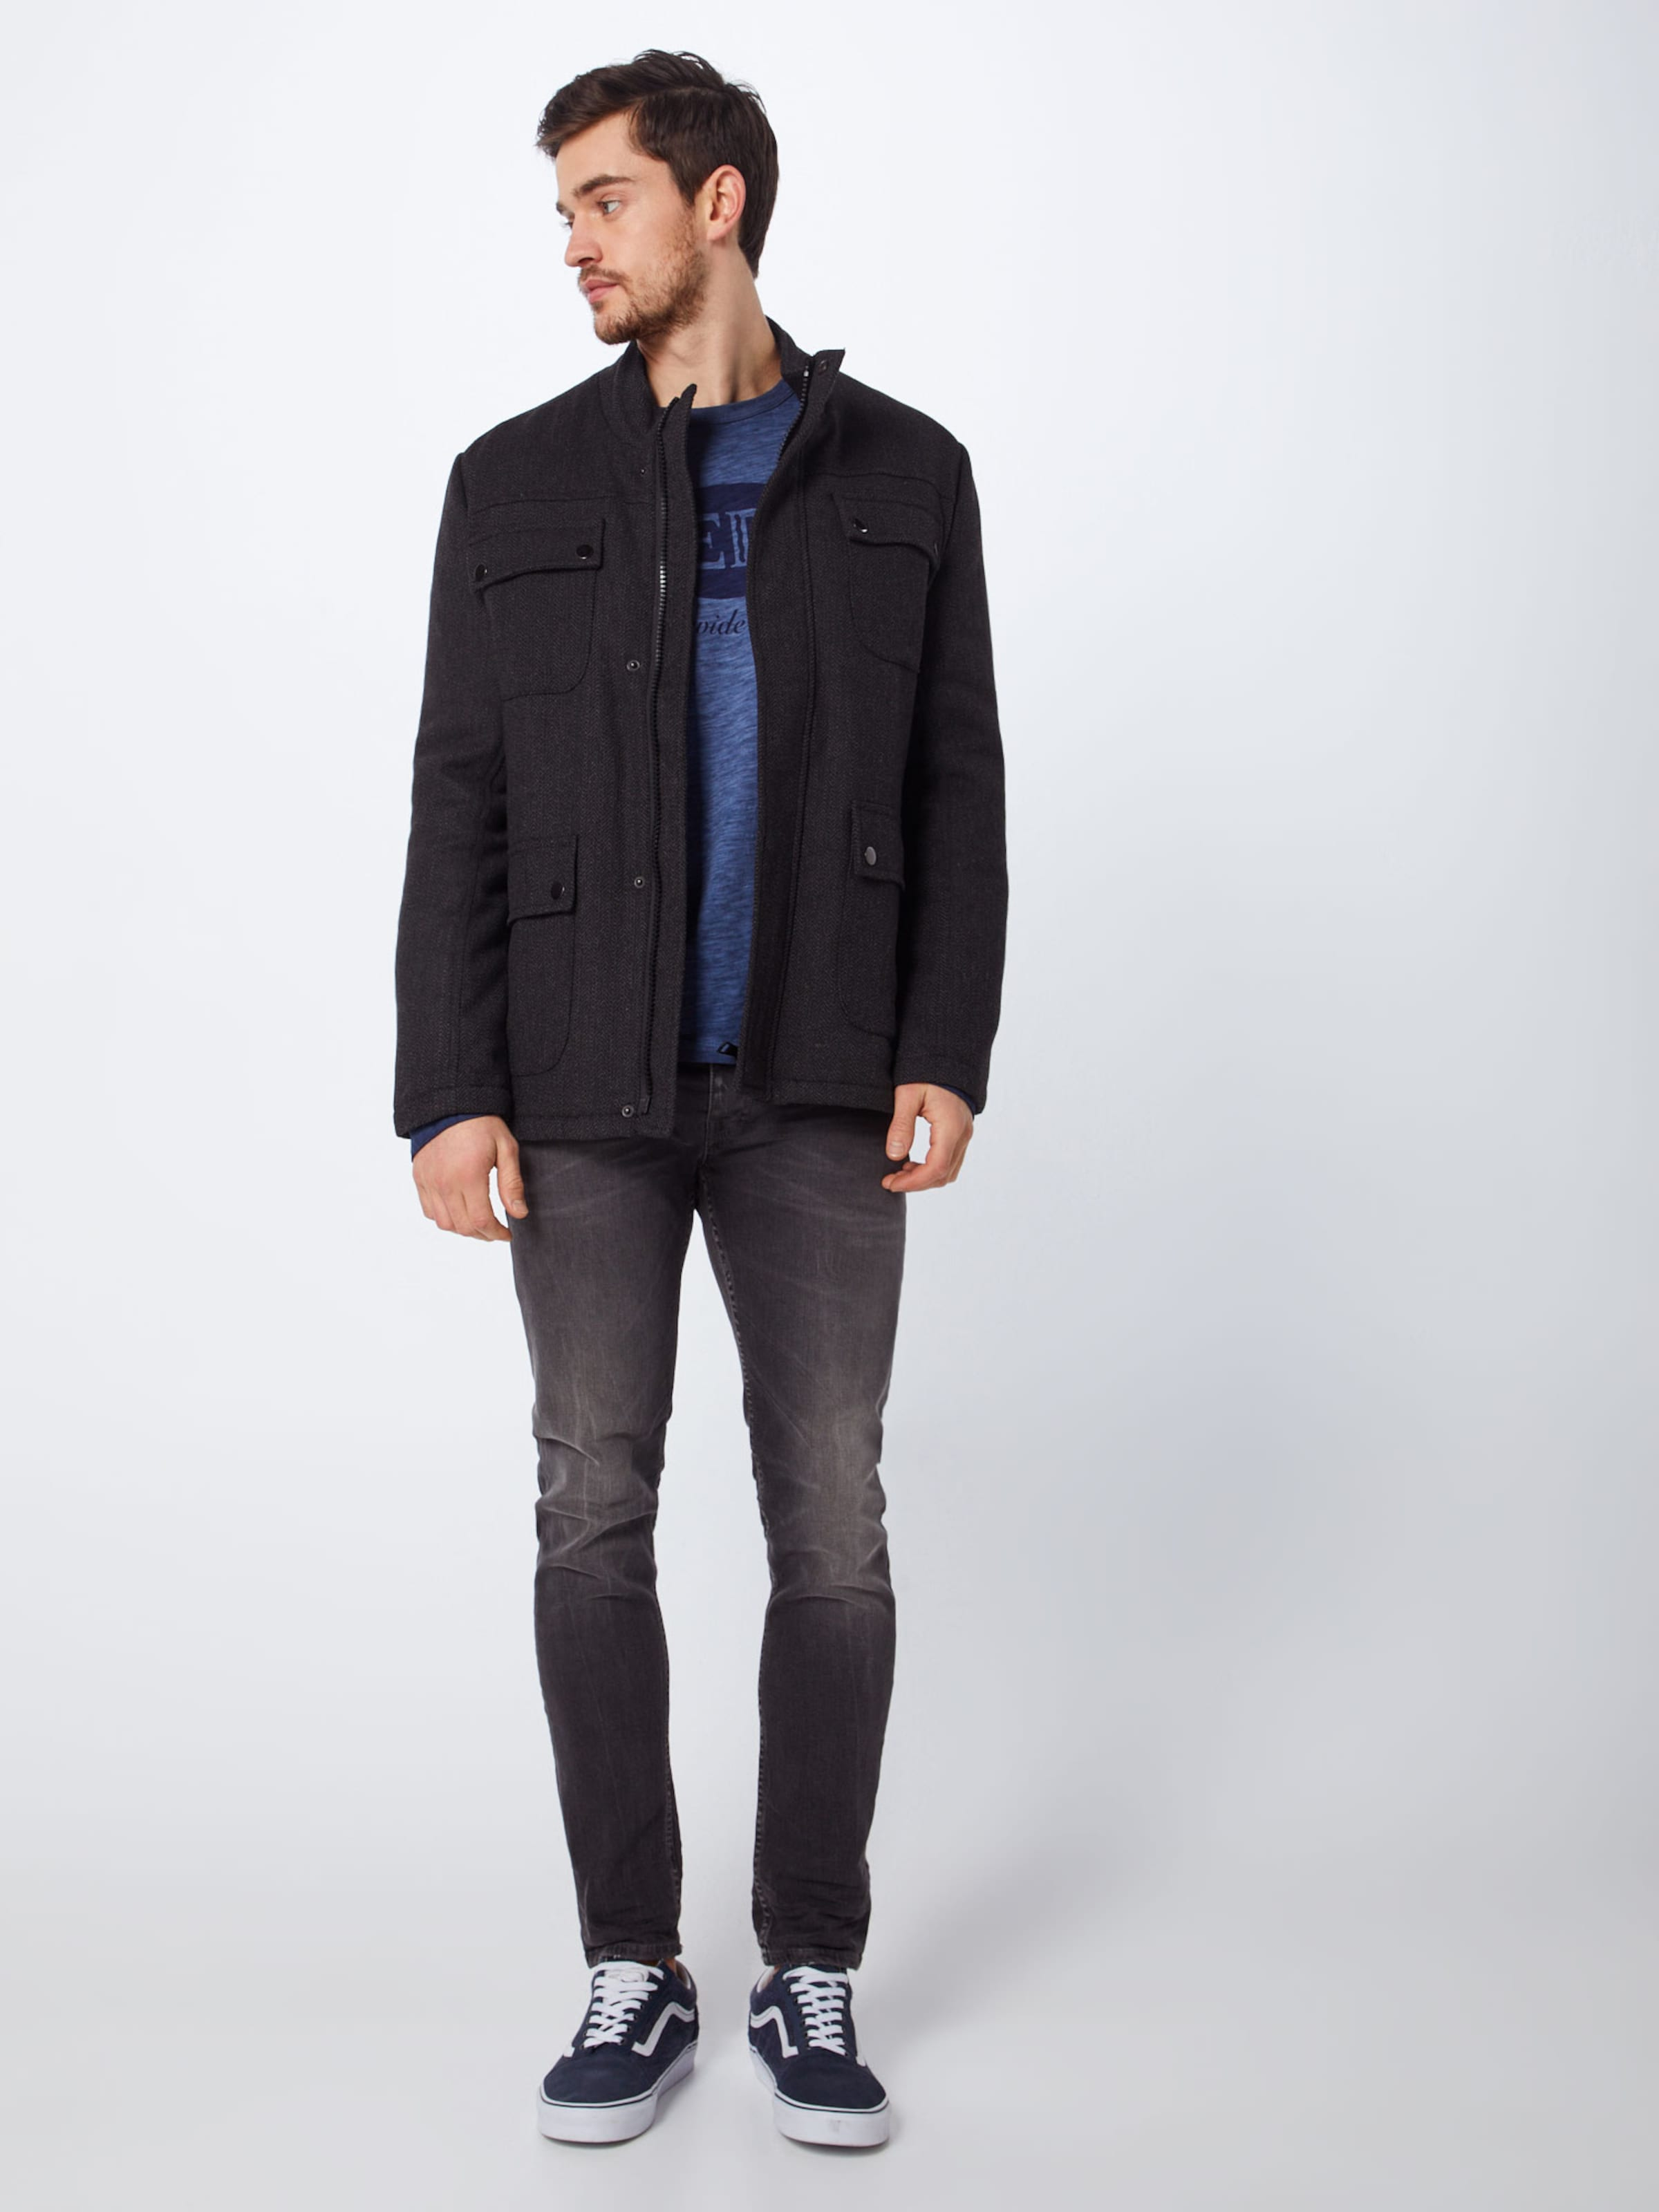 shirt Jeans Pepe 'duran Bleu En T Ls' Foncé VpUMSz